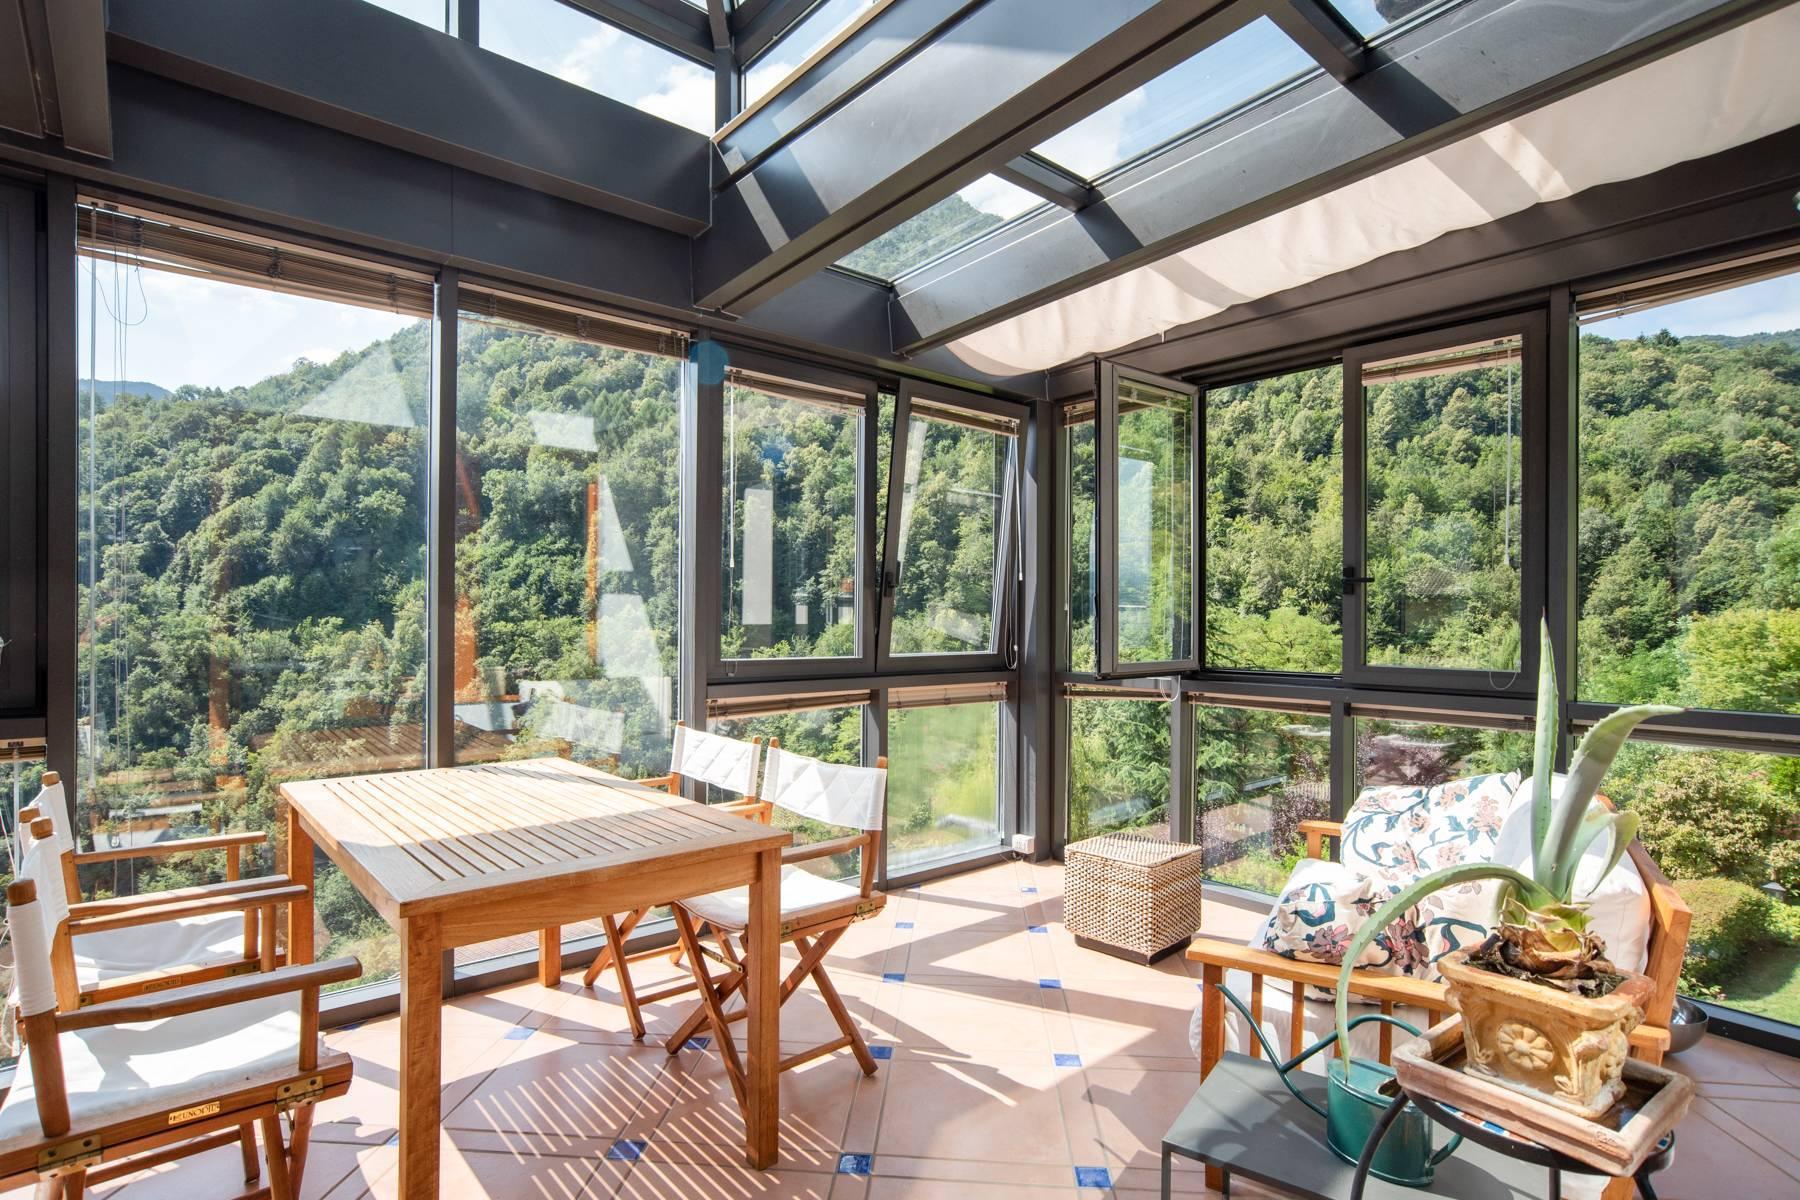 Splendida villa moderna sulla collina soleggiata sopra Argegno - 19